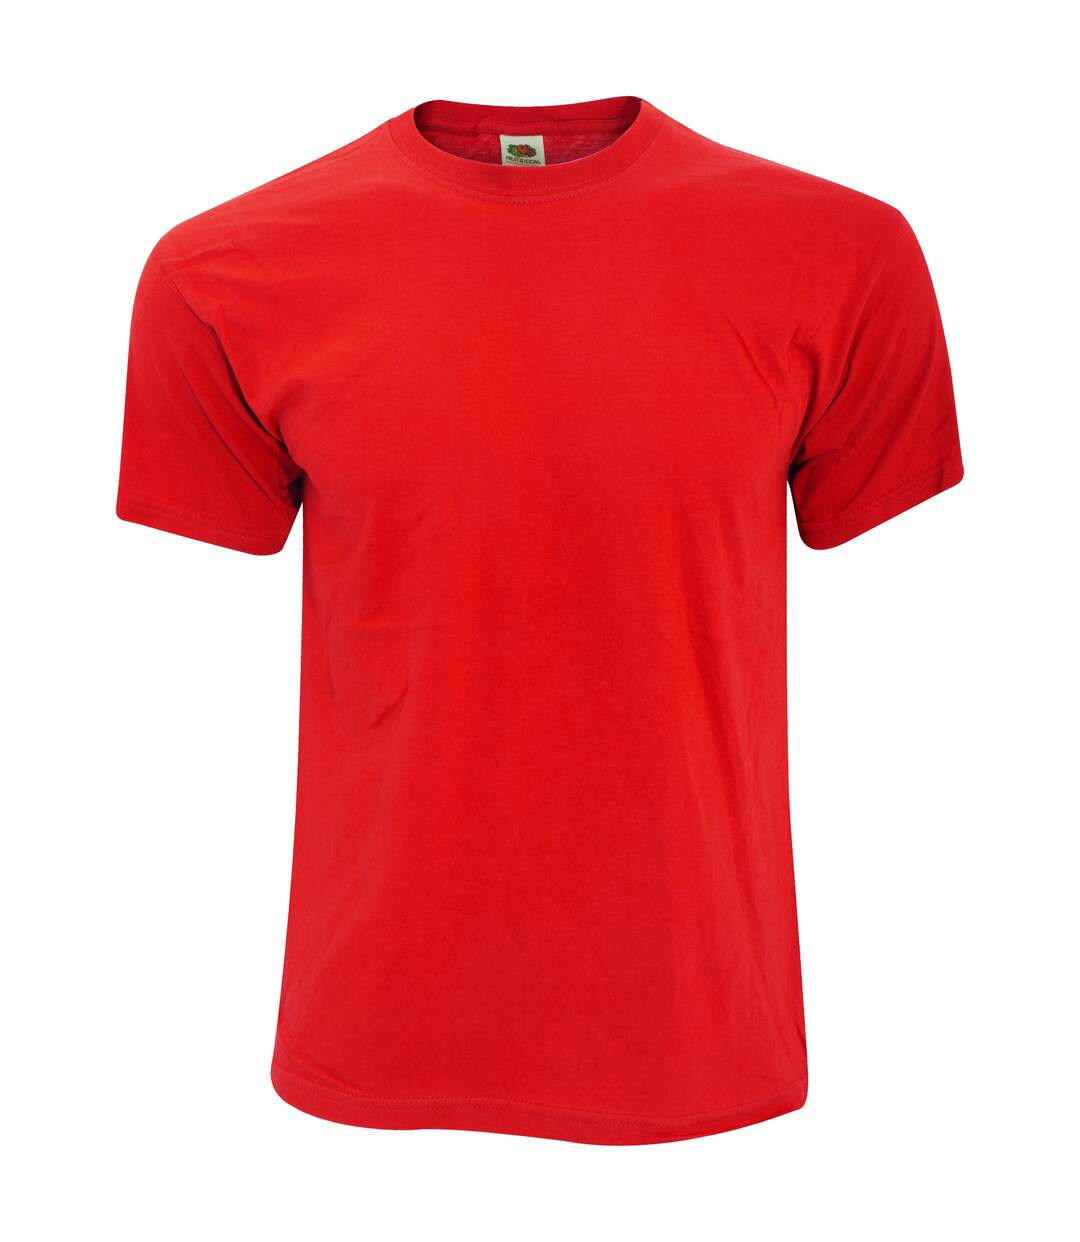 Fruit Of The Loom - T-shirt ORIGINAL - Homme (Rouge) - UTBC340